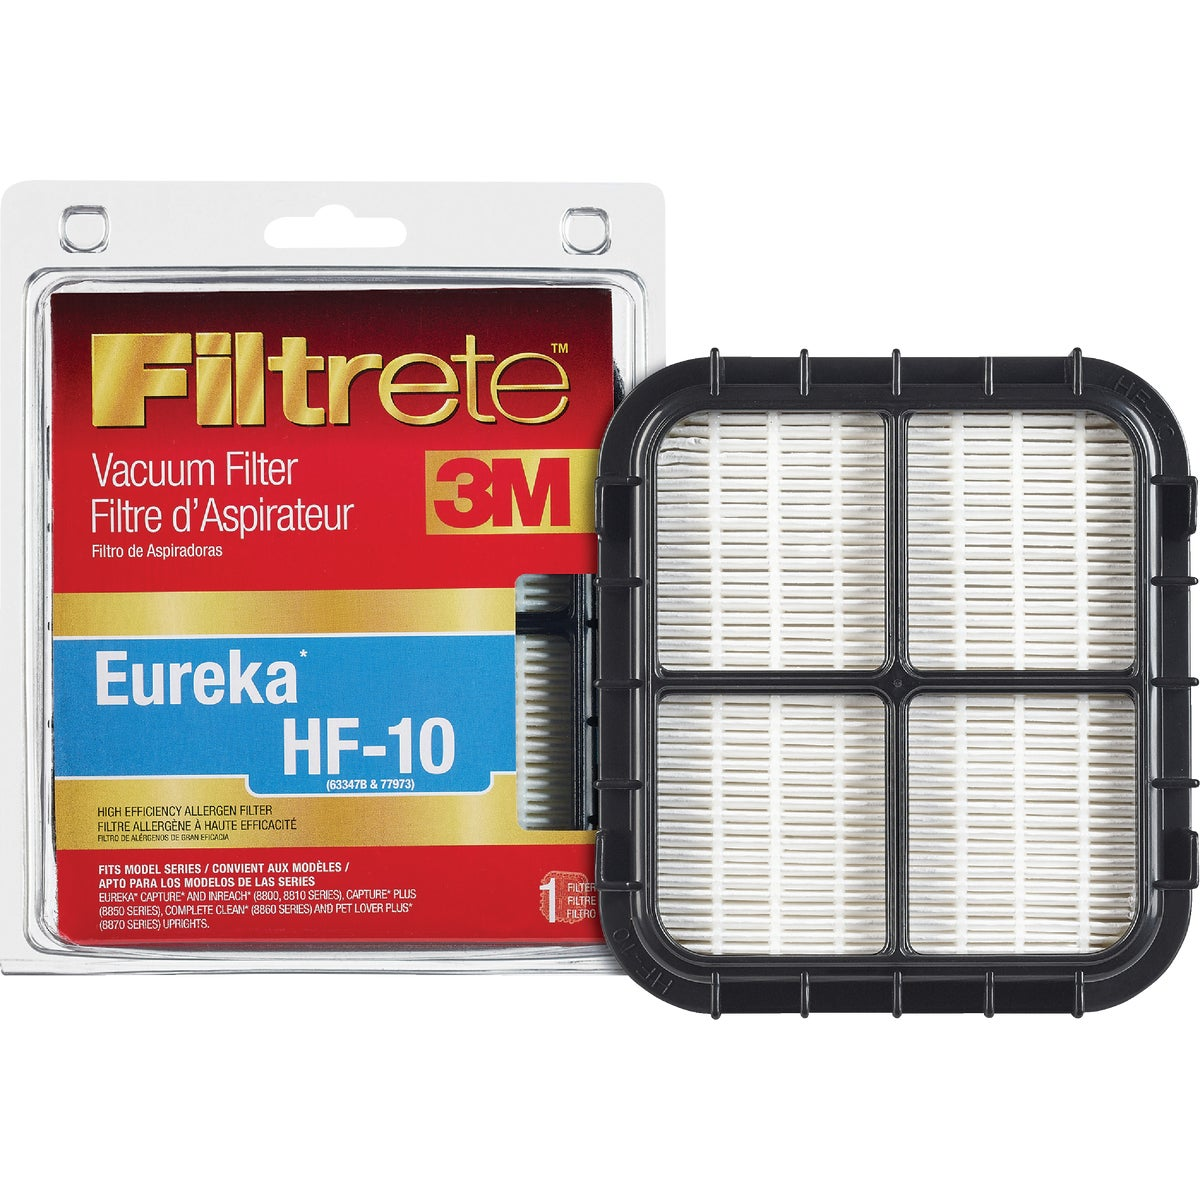 Eureka HF10 Hepa Vacuum Filter, 67810B